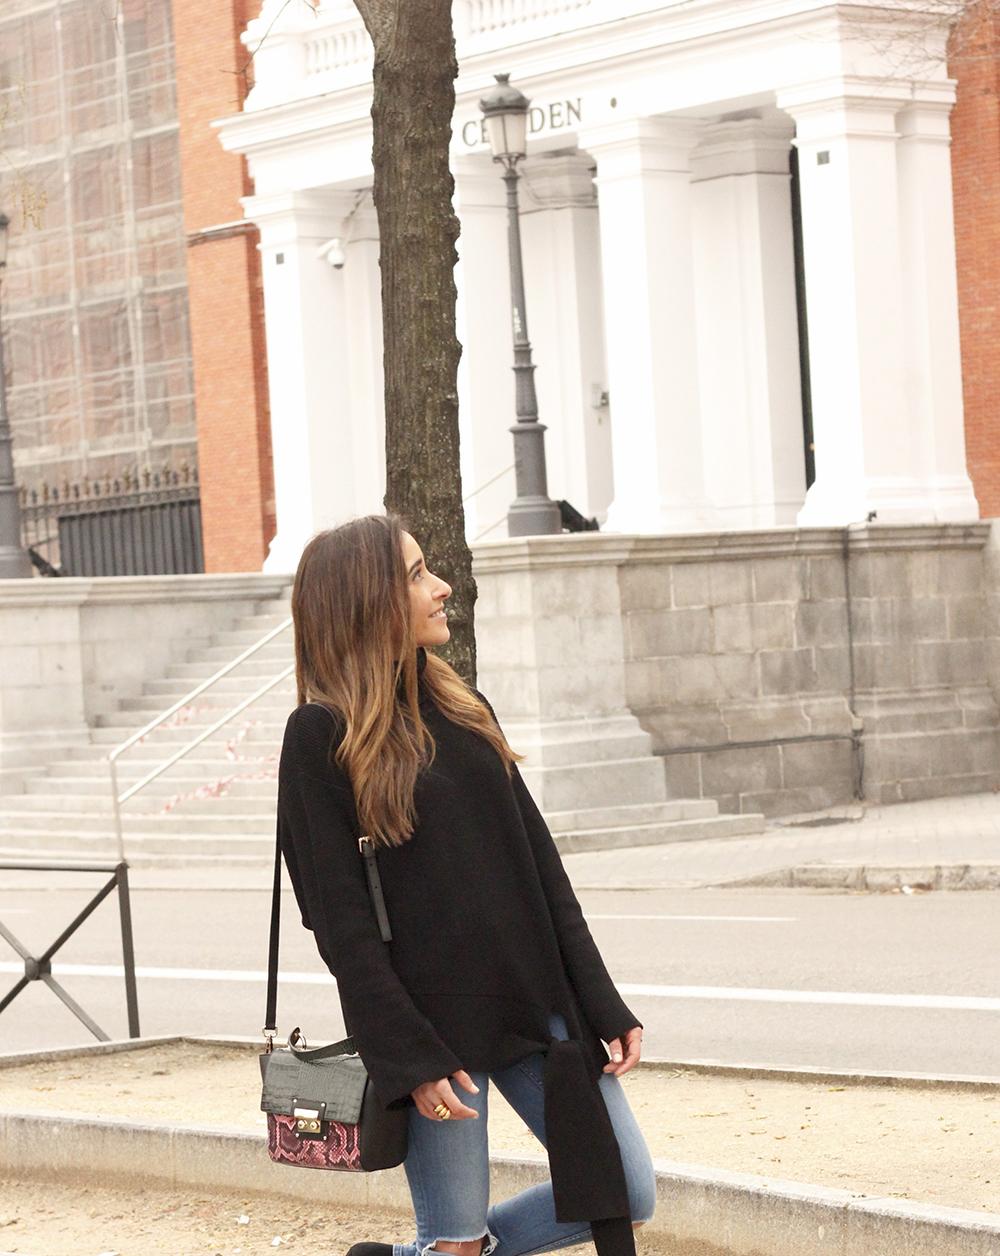 Black turtleneck sweater Uterqüe black ankle boots winter oufit 201803